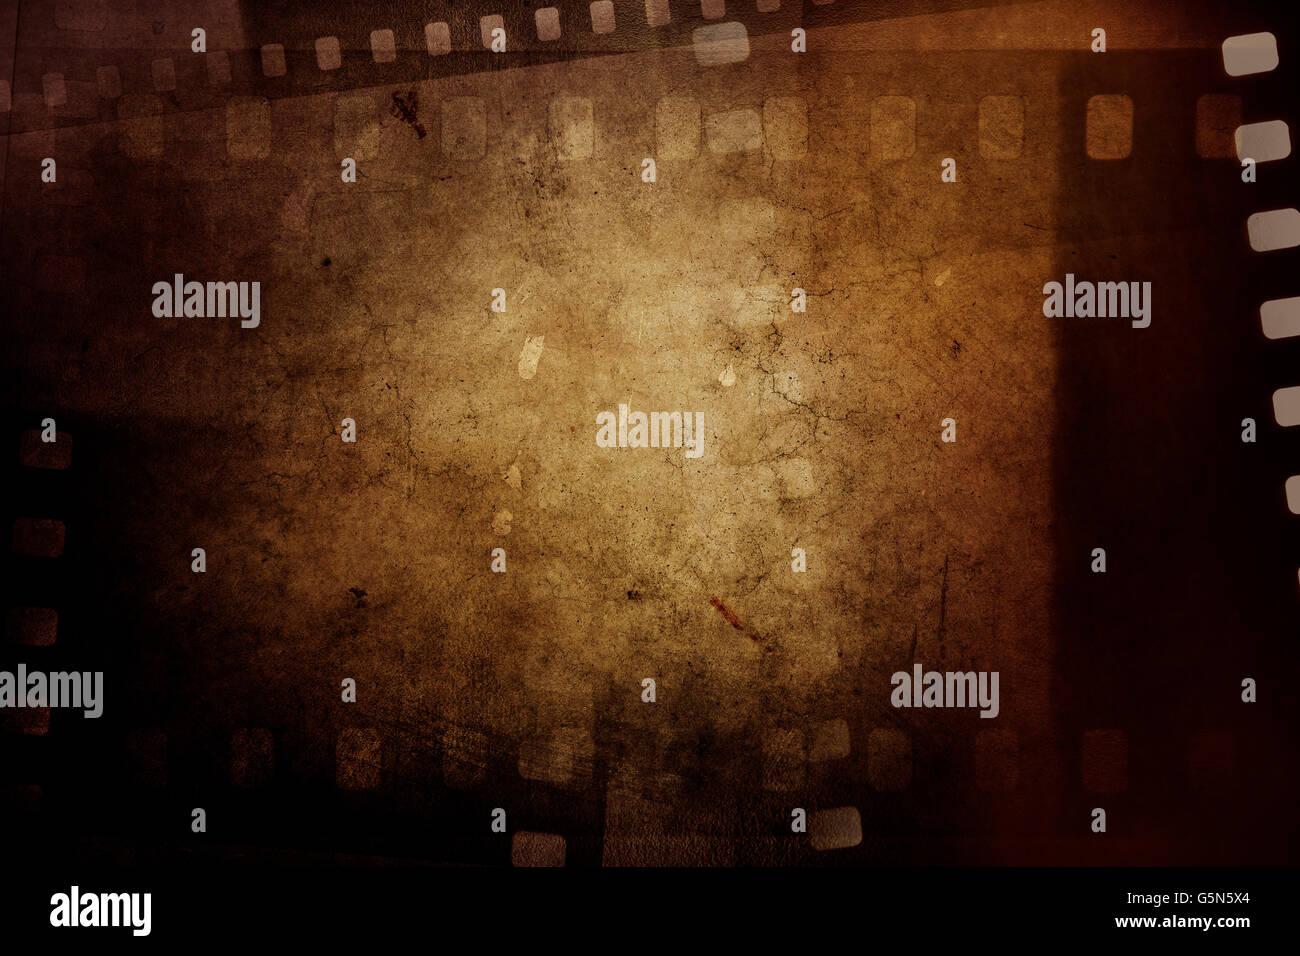 Film negative frames on grunge background Stock Photo